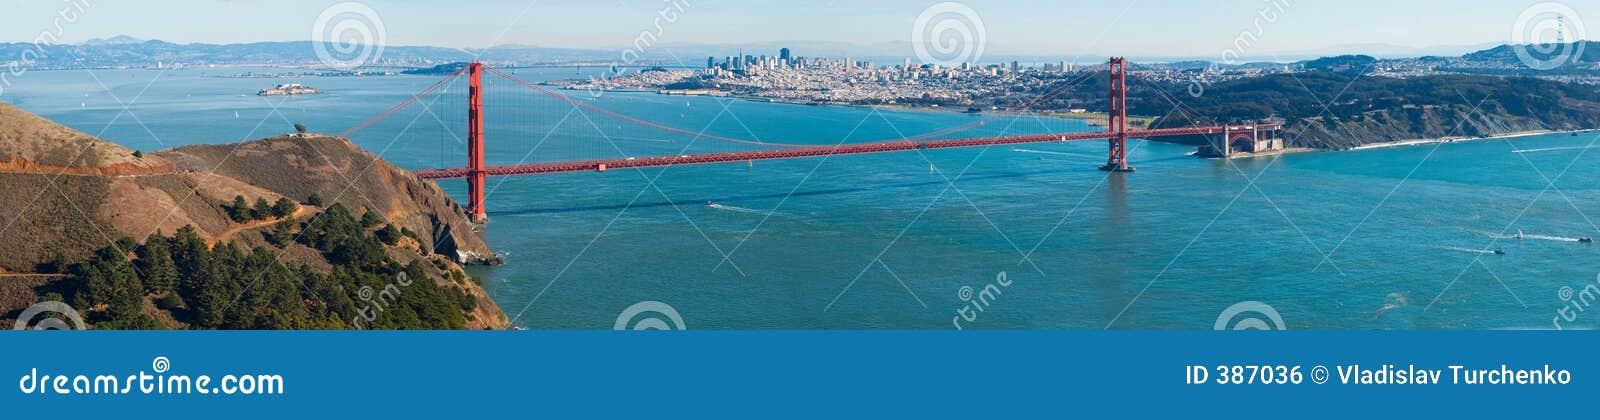 Panorama de pont en porte d or